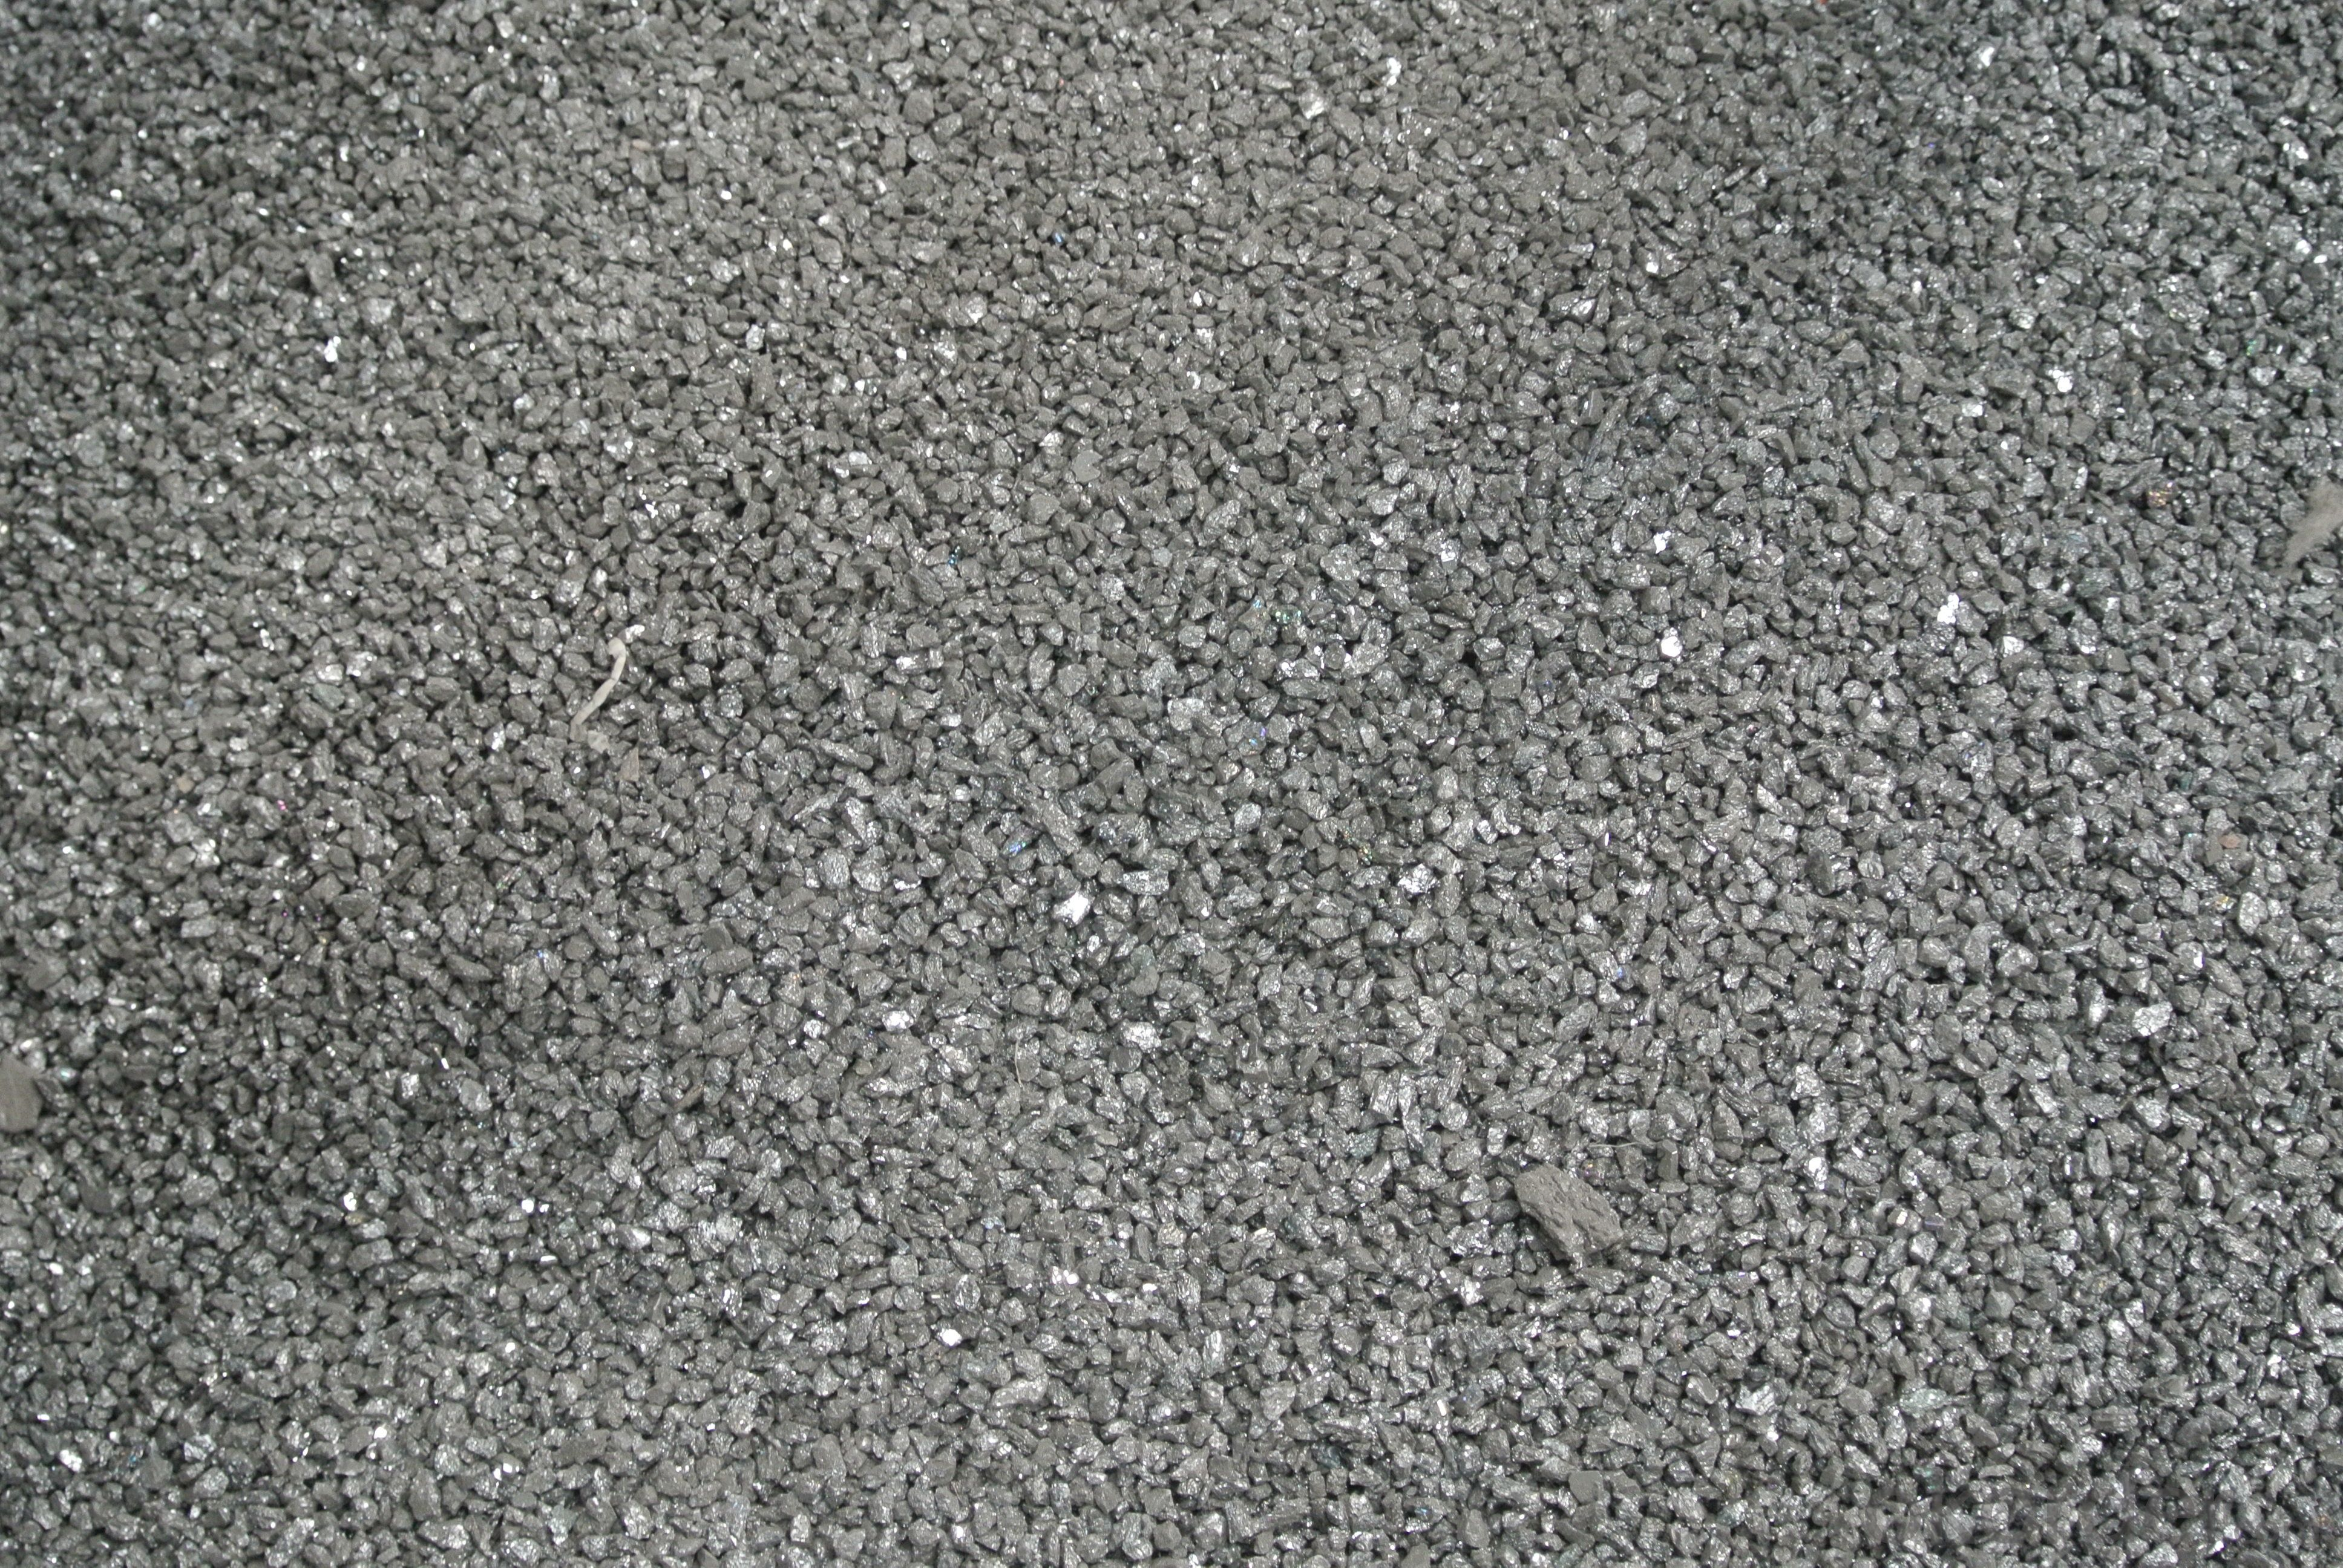 Silicon carbide bonded silicon nitride products - silicon carbide slurry